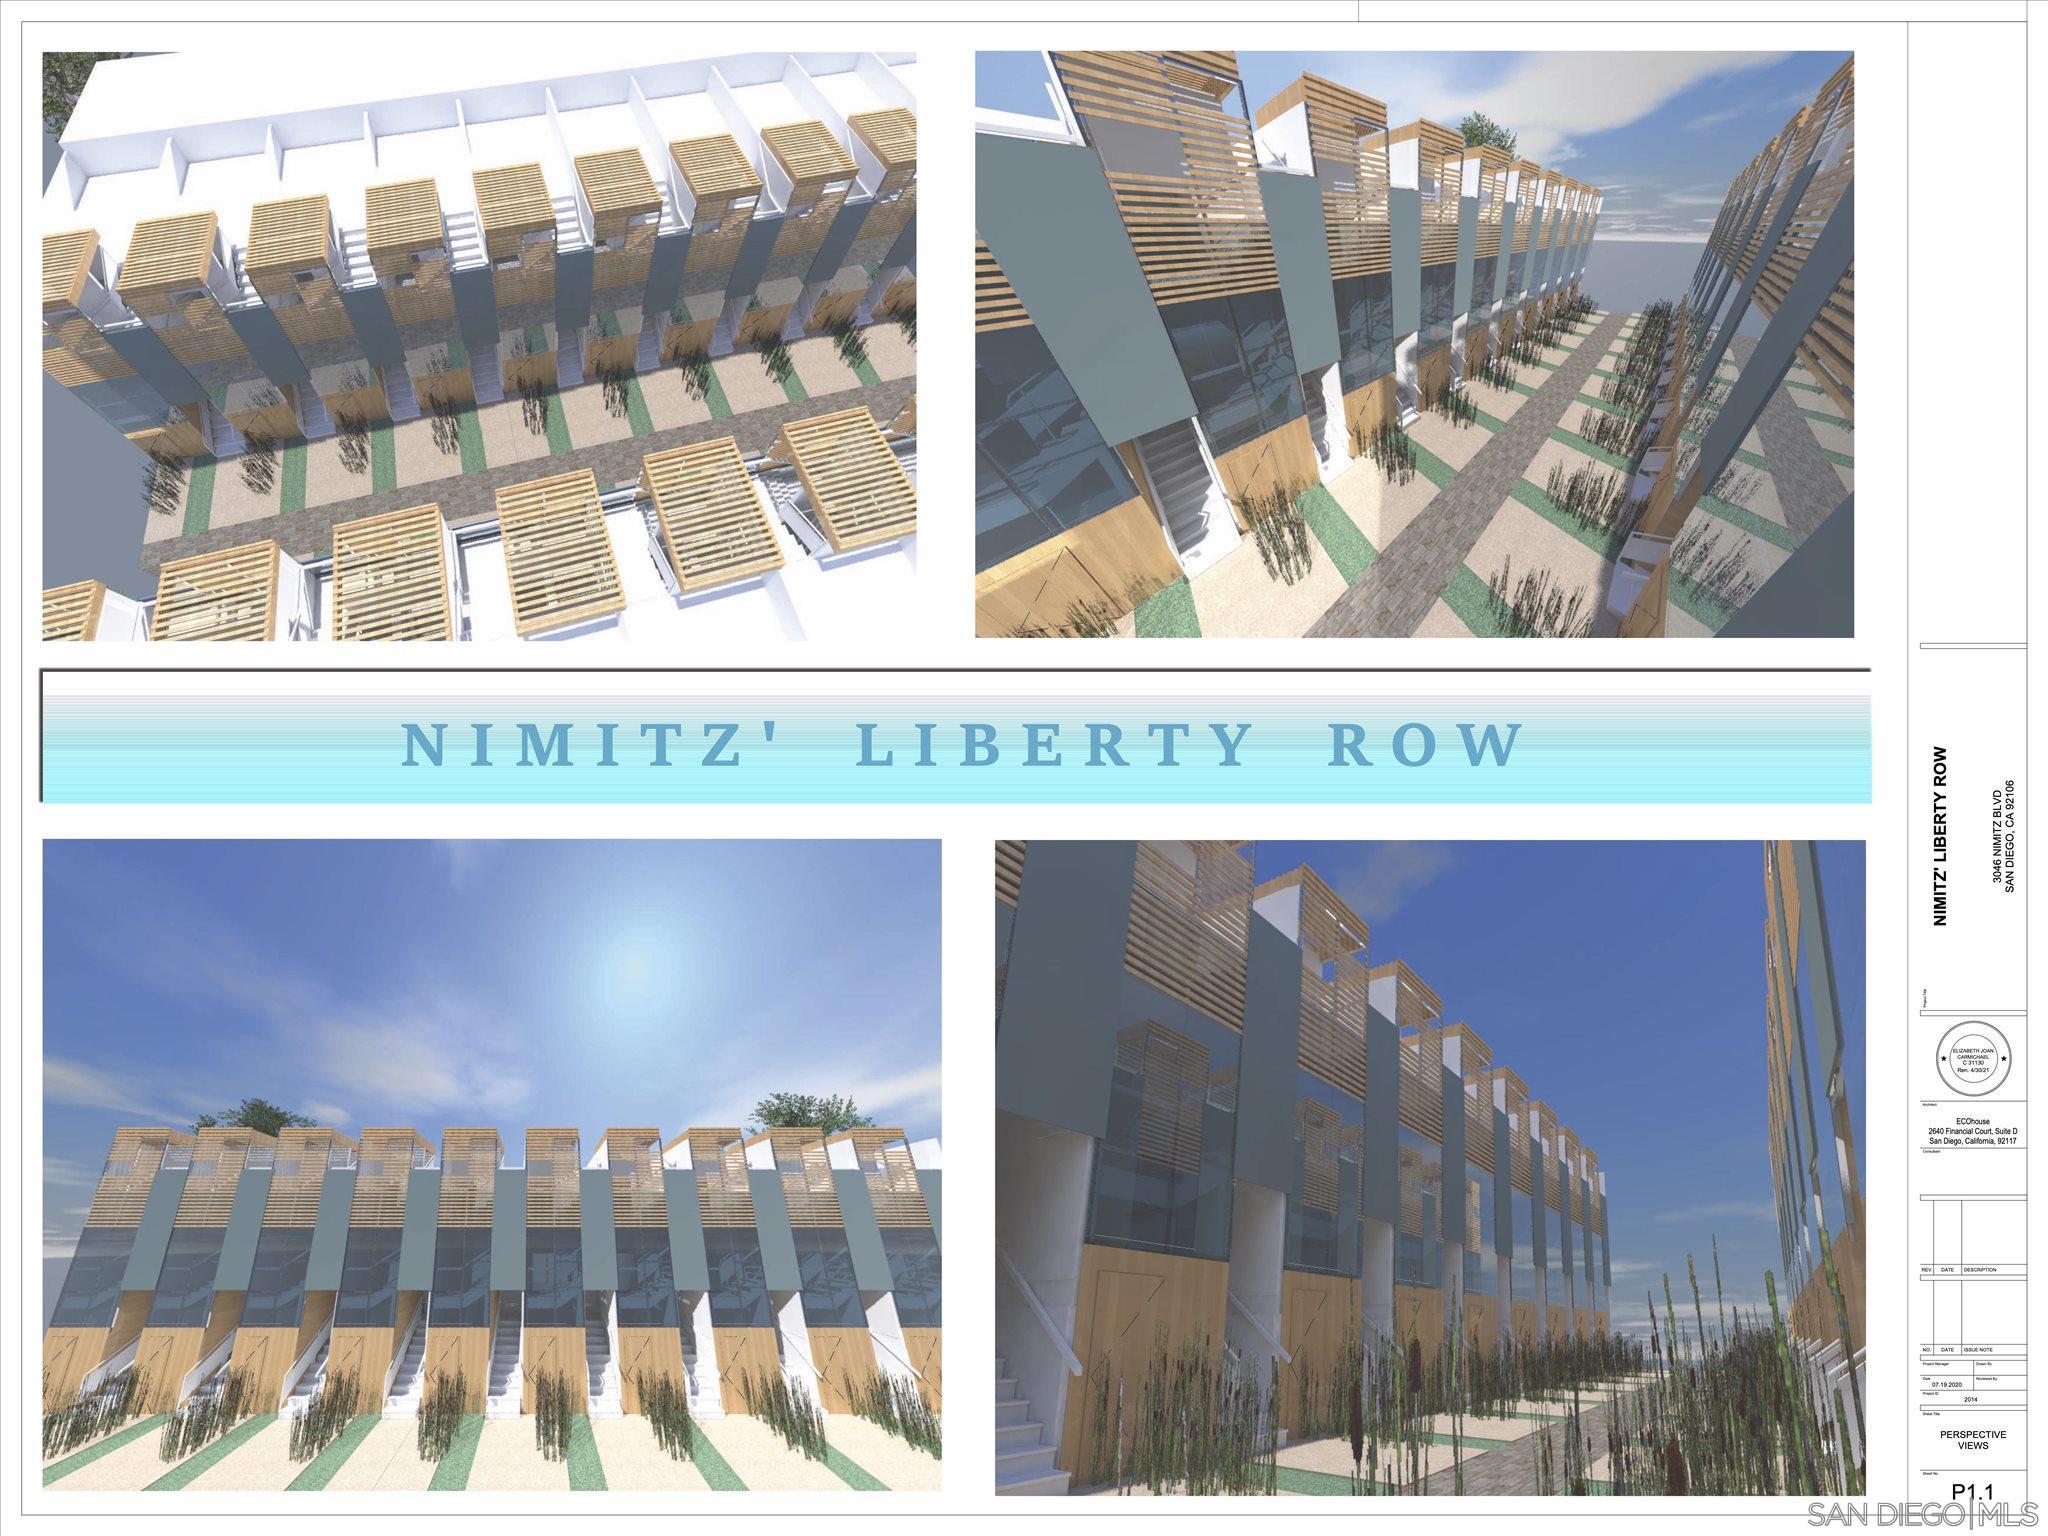 3046 Nimitz Blvd., San Diego, CA 92106